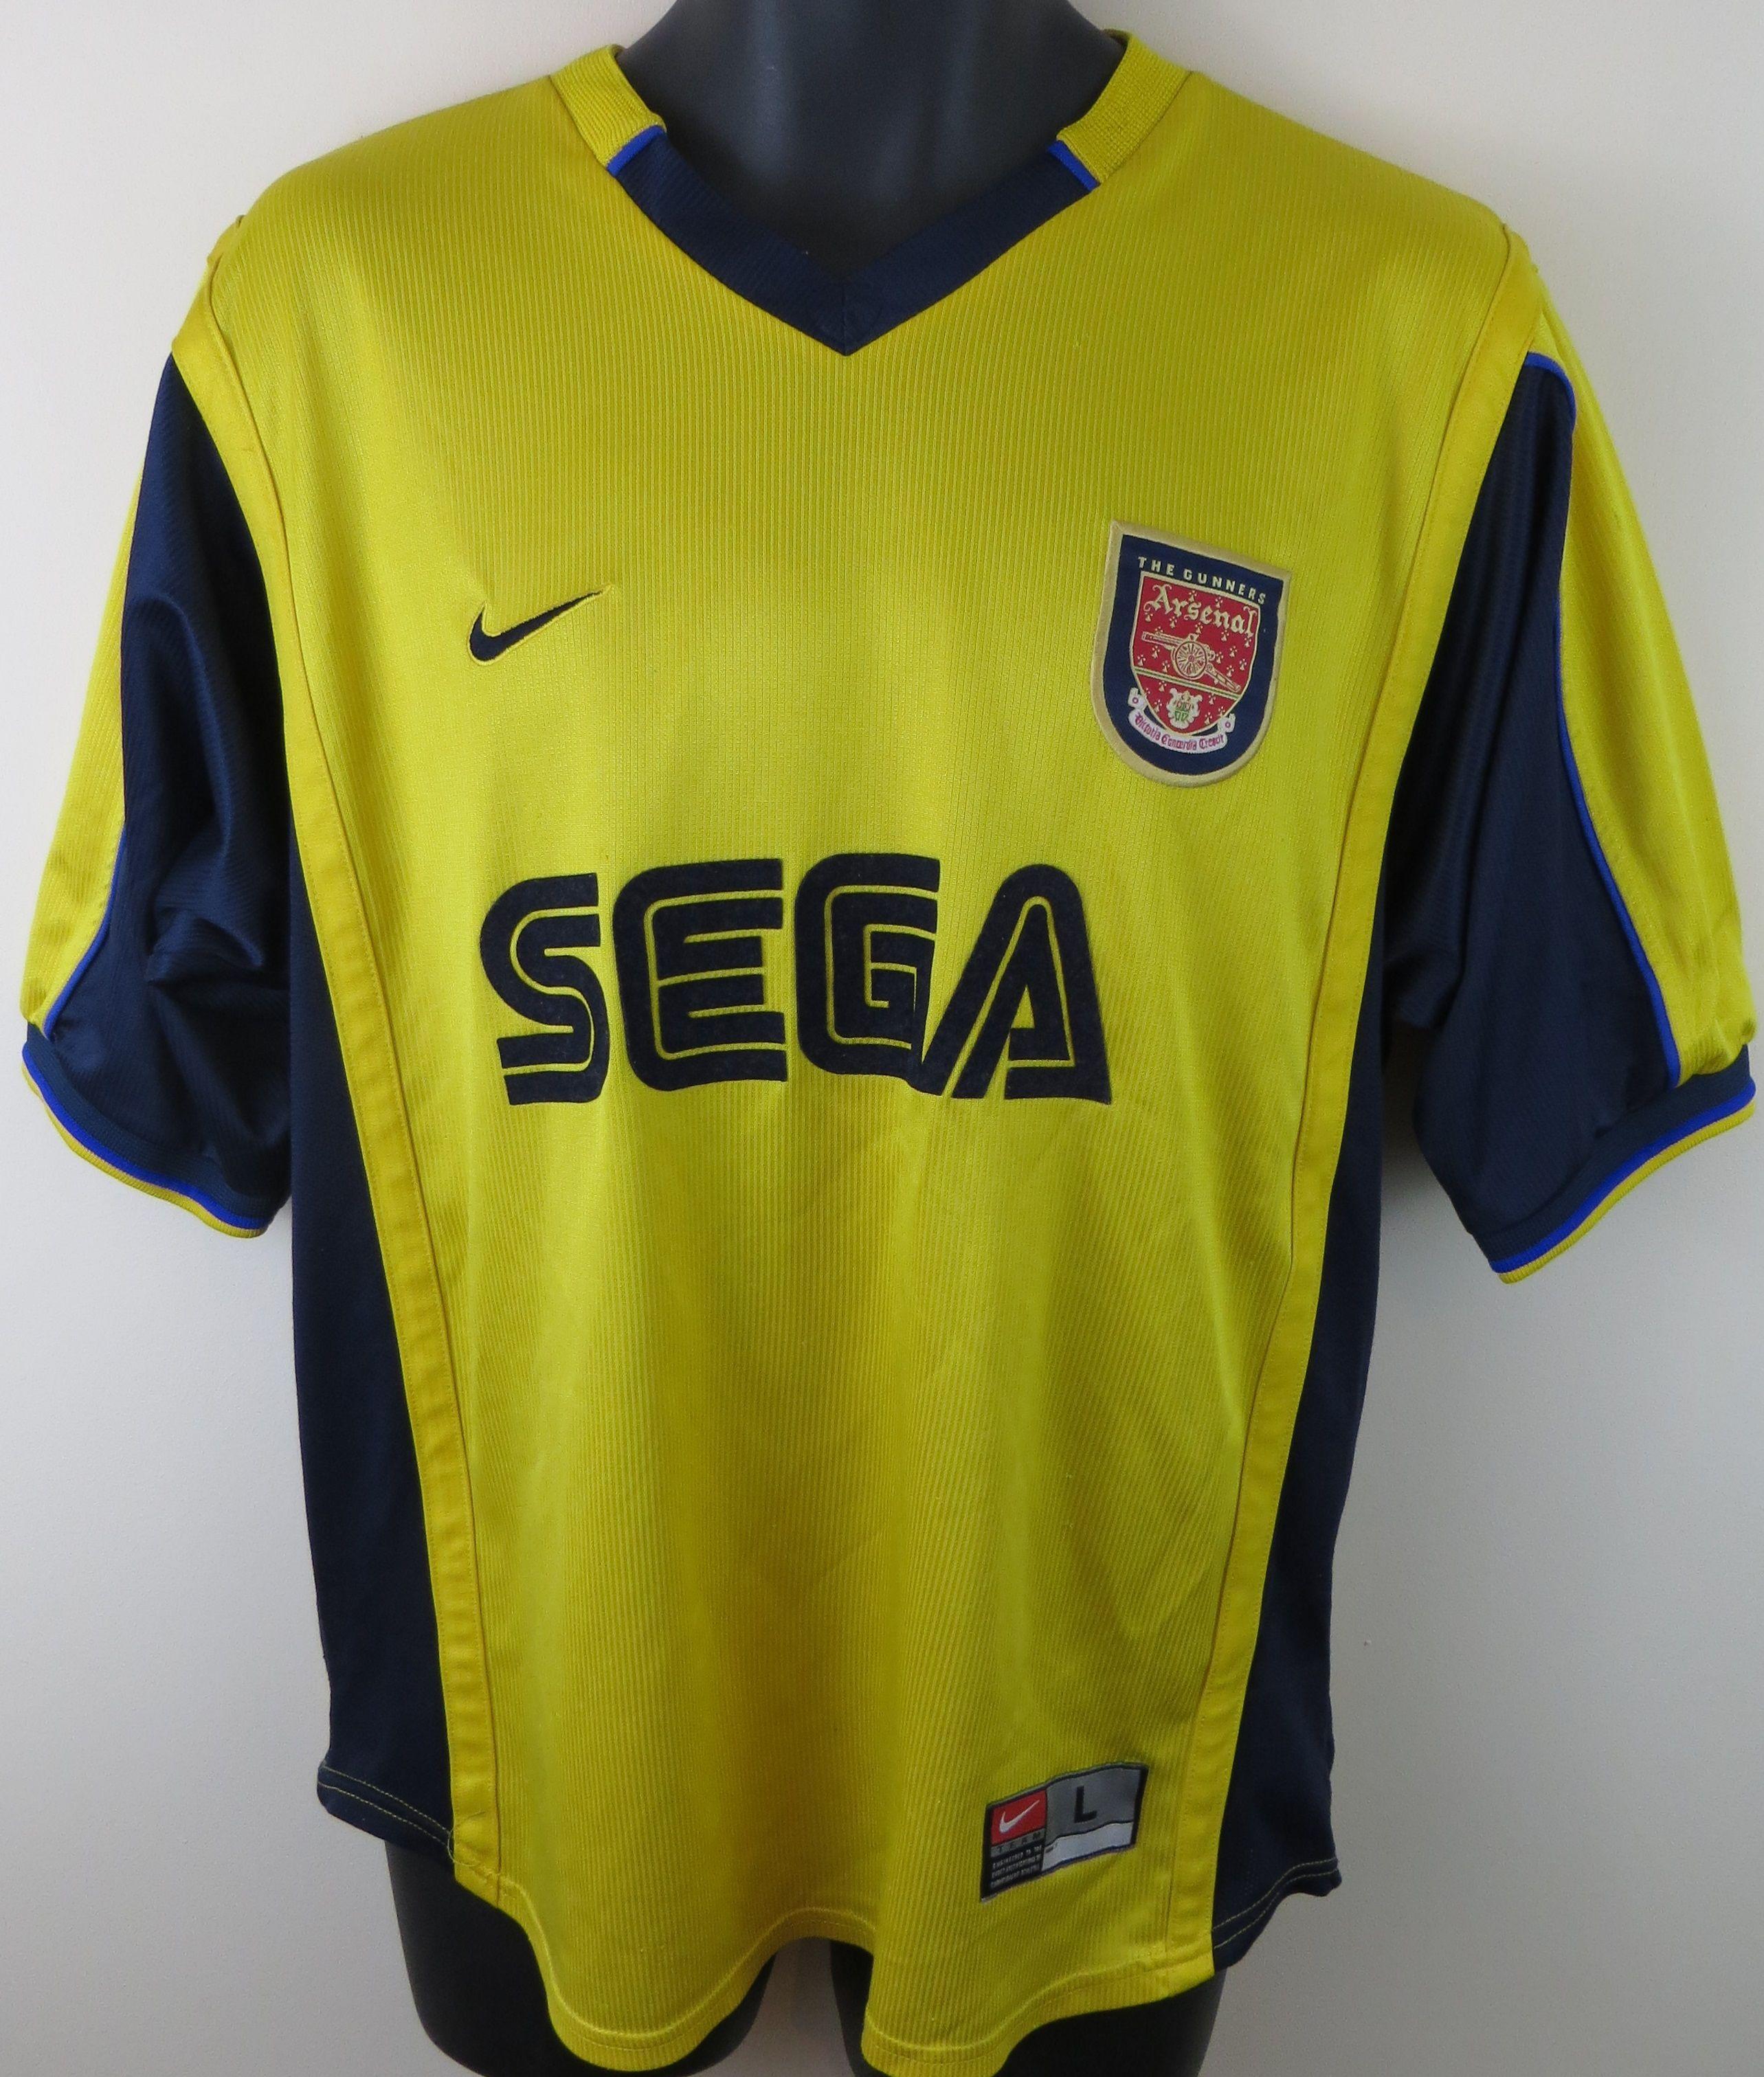 wholesale dealer e643f 52d44 Arsenal away SEGA shirt by Nike | Retro Football Shirts ...